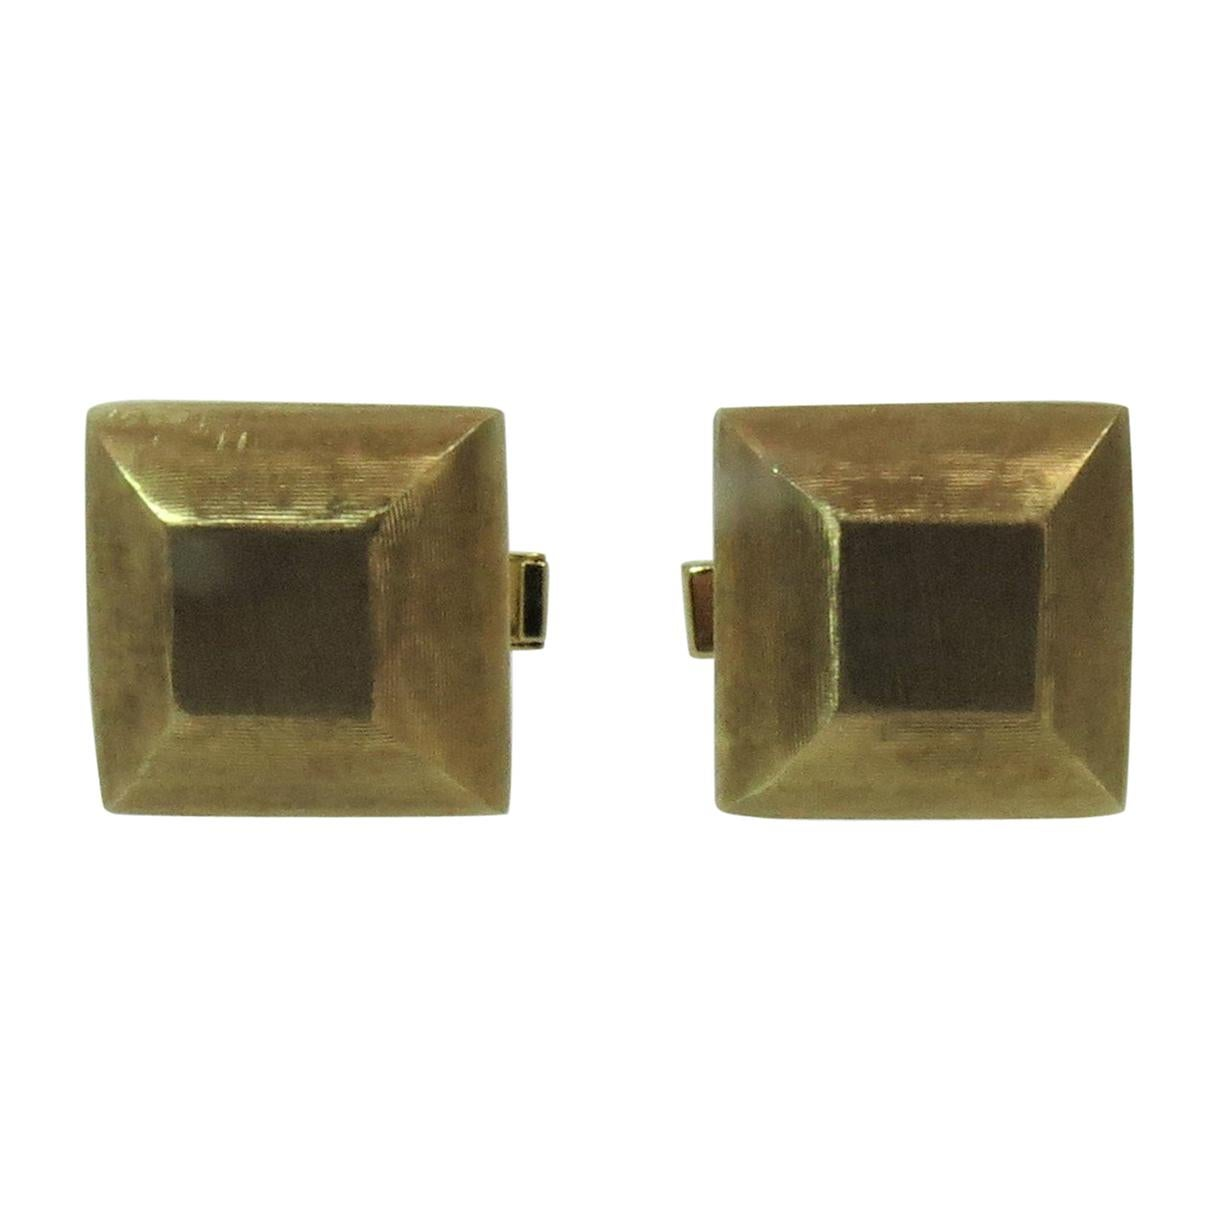 14 Karat Yellow Gold Linen Finish Square Cufflinks